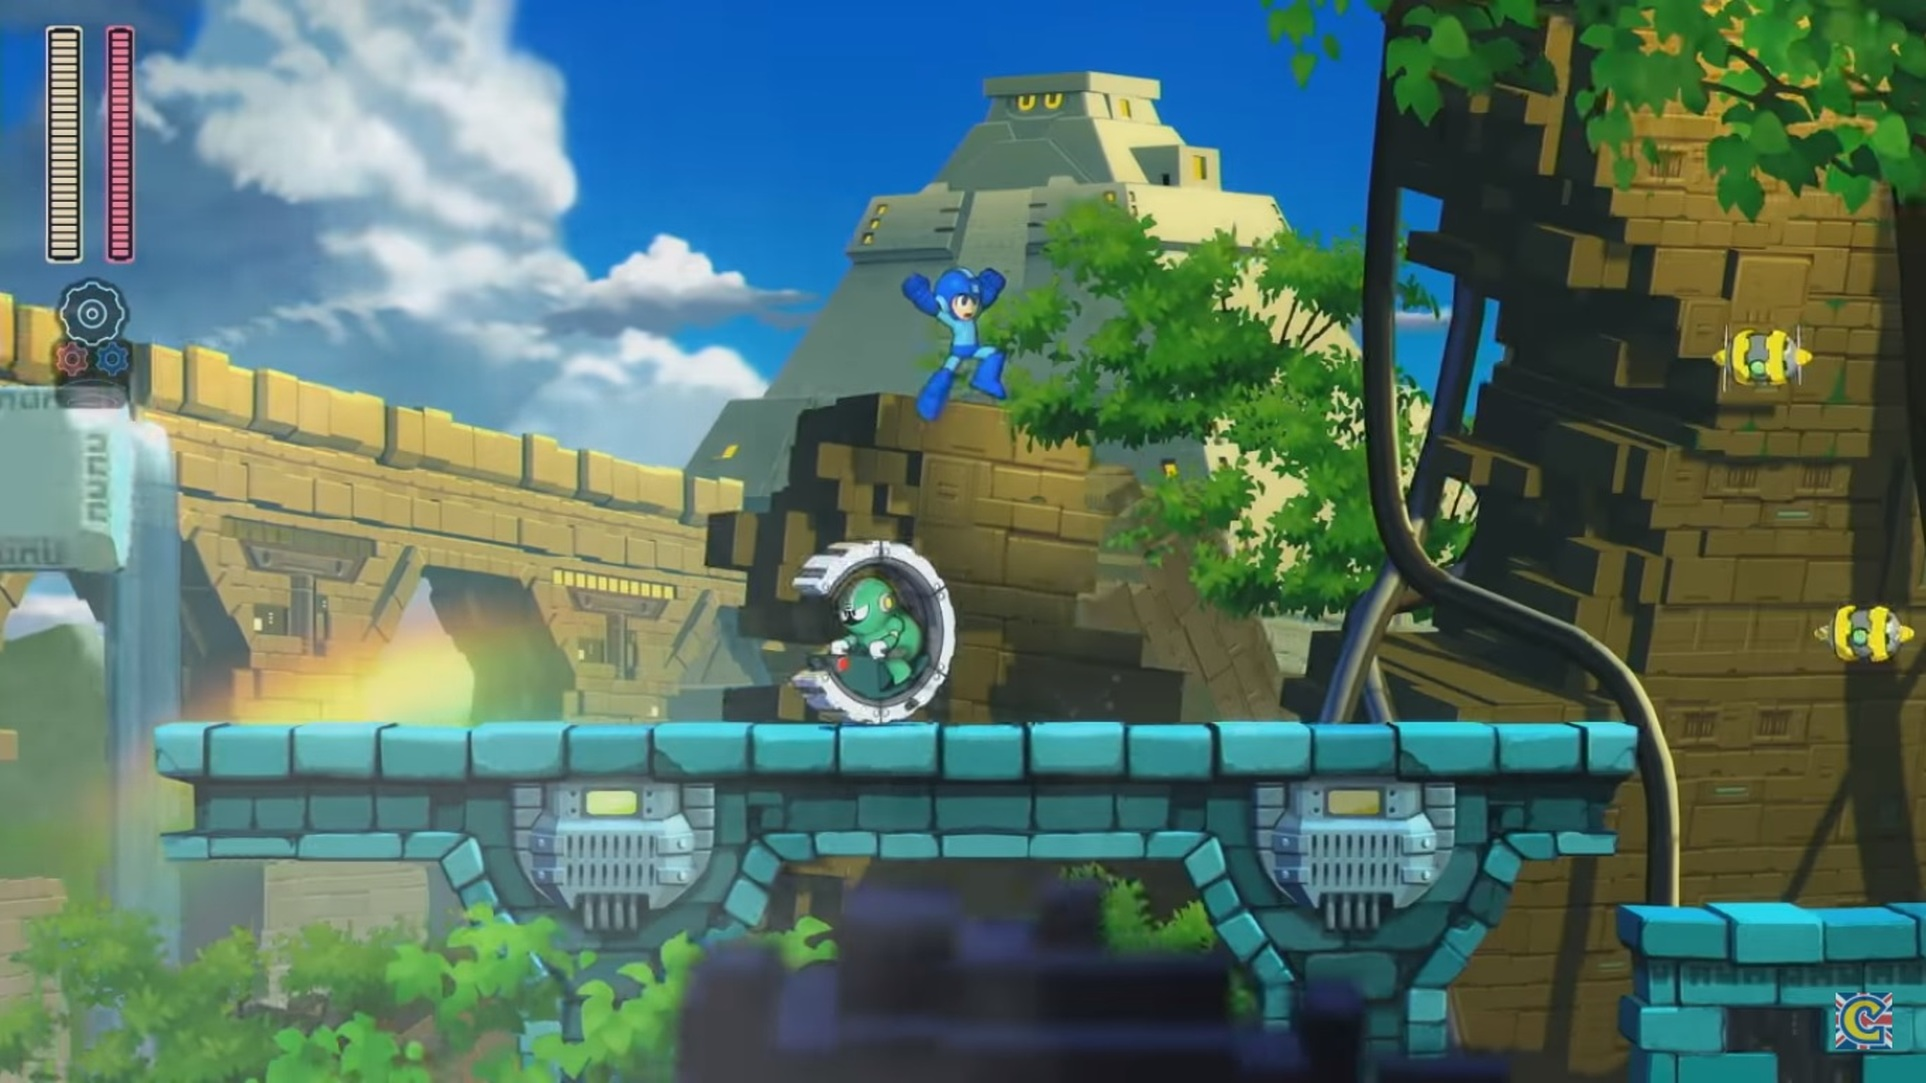 Mega Man 11, Mega Man X Collection Announced, Coming in 2018